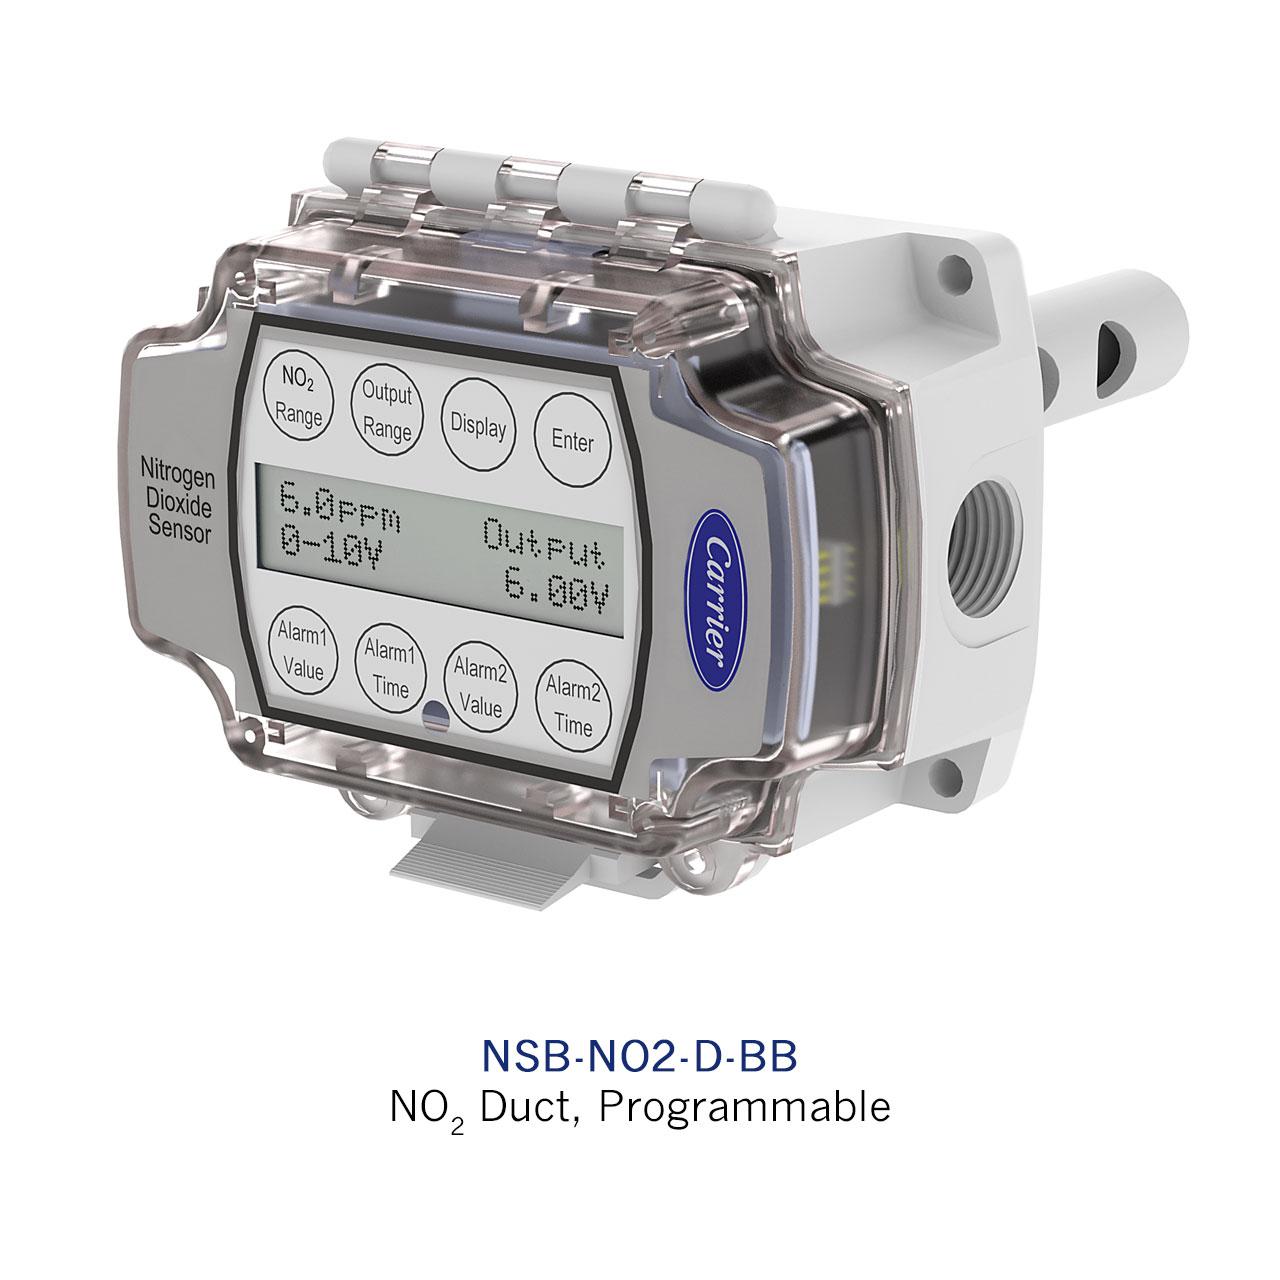 carrier-NSB-LDT4-RS10-BB-remote-spot-water-leak